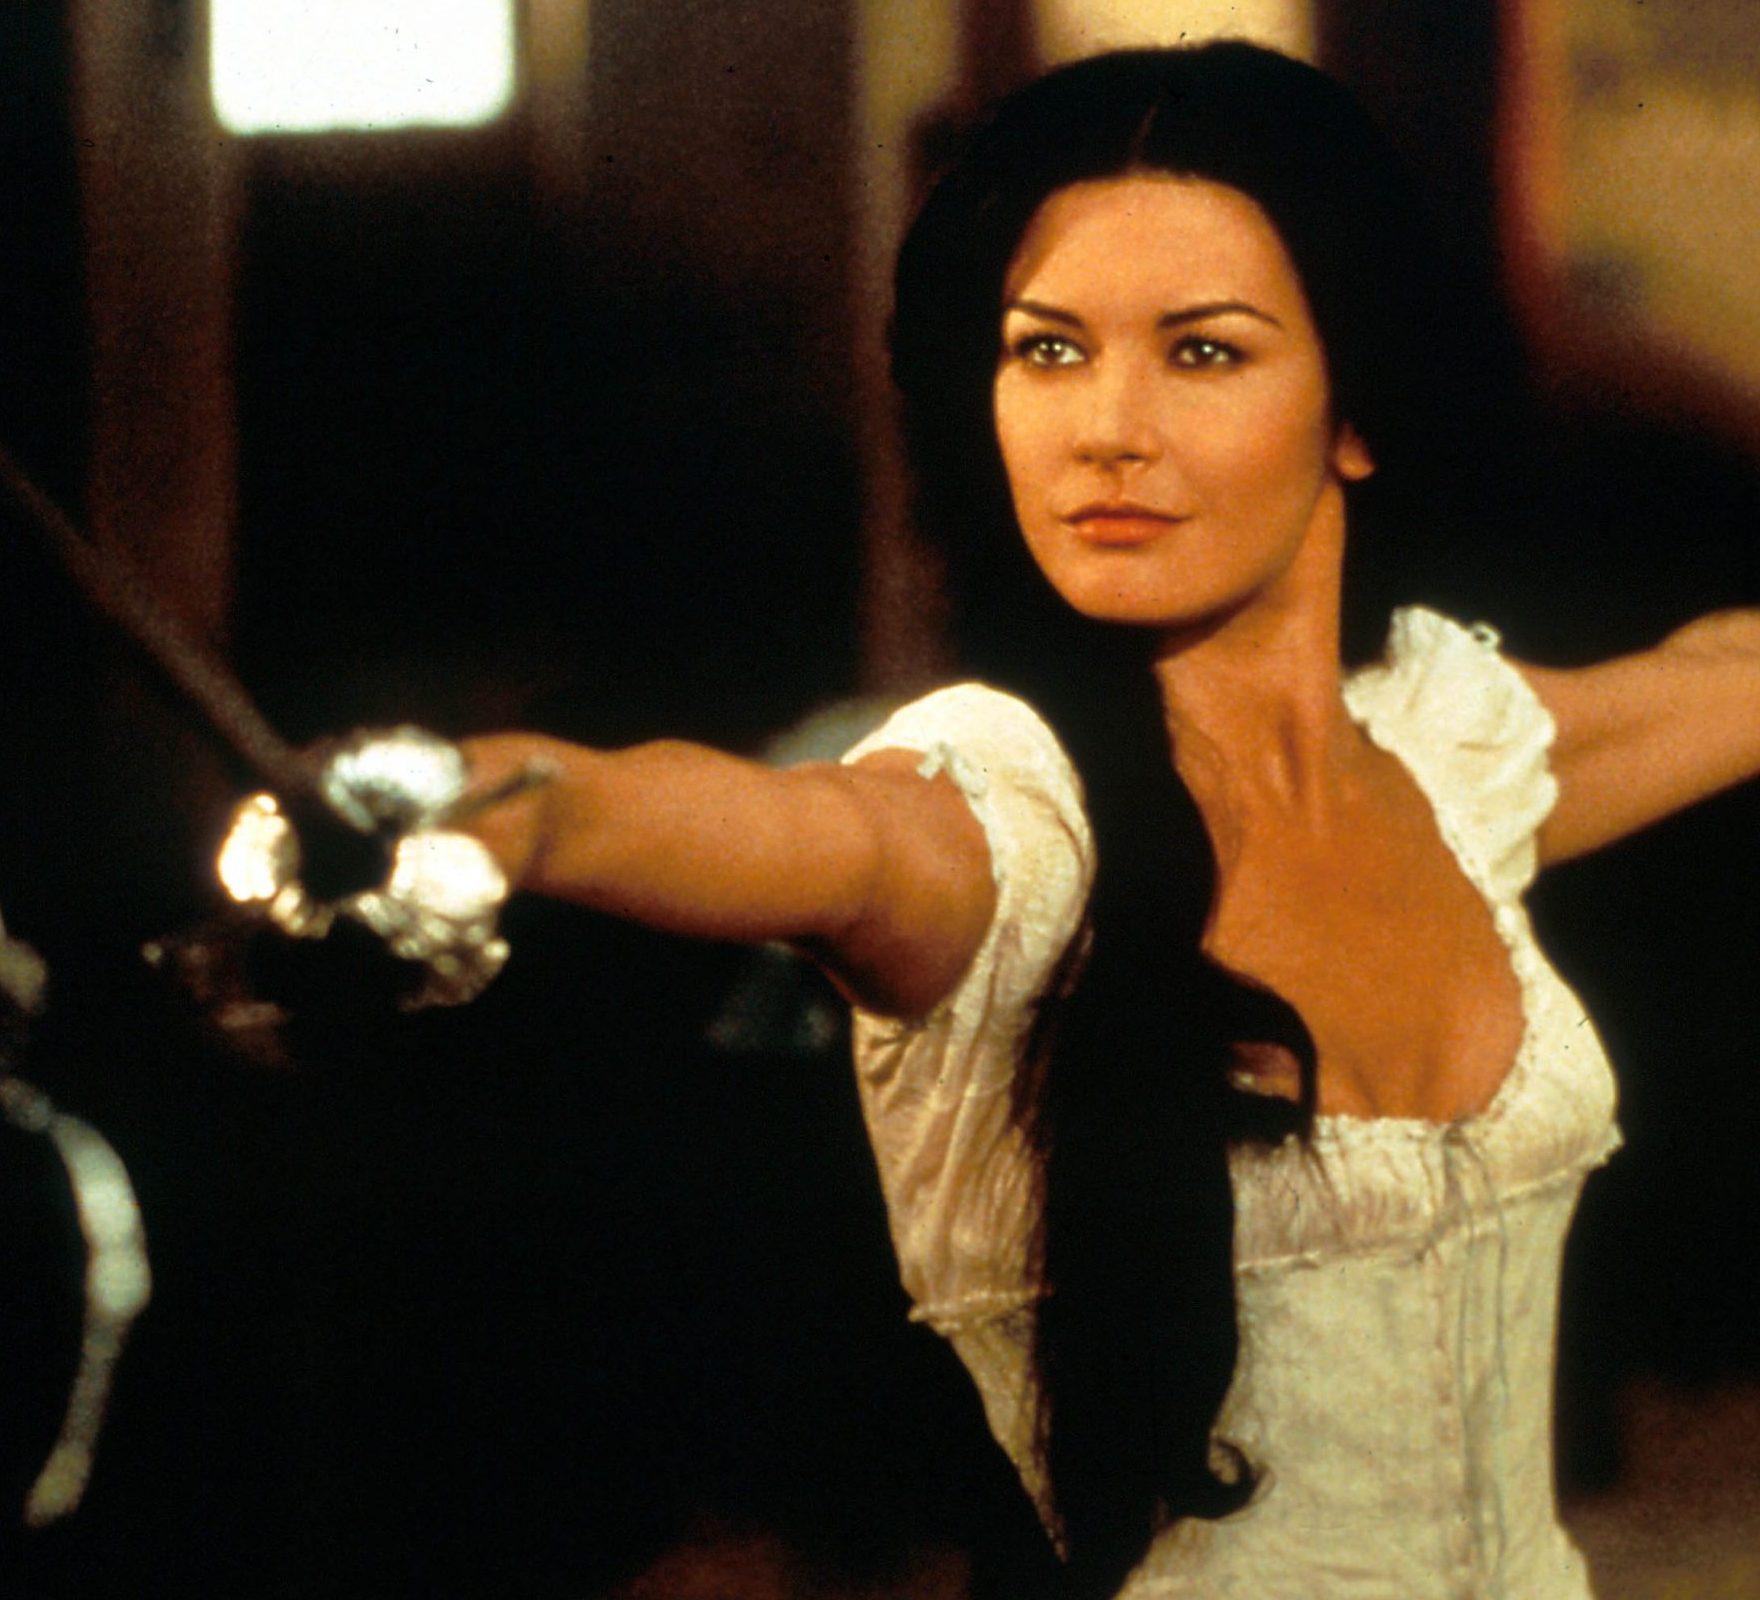 zorro catherine zeta jones scaled e1623164443533 The Best (And Worst) Films Inspired By Indiana Jones